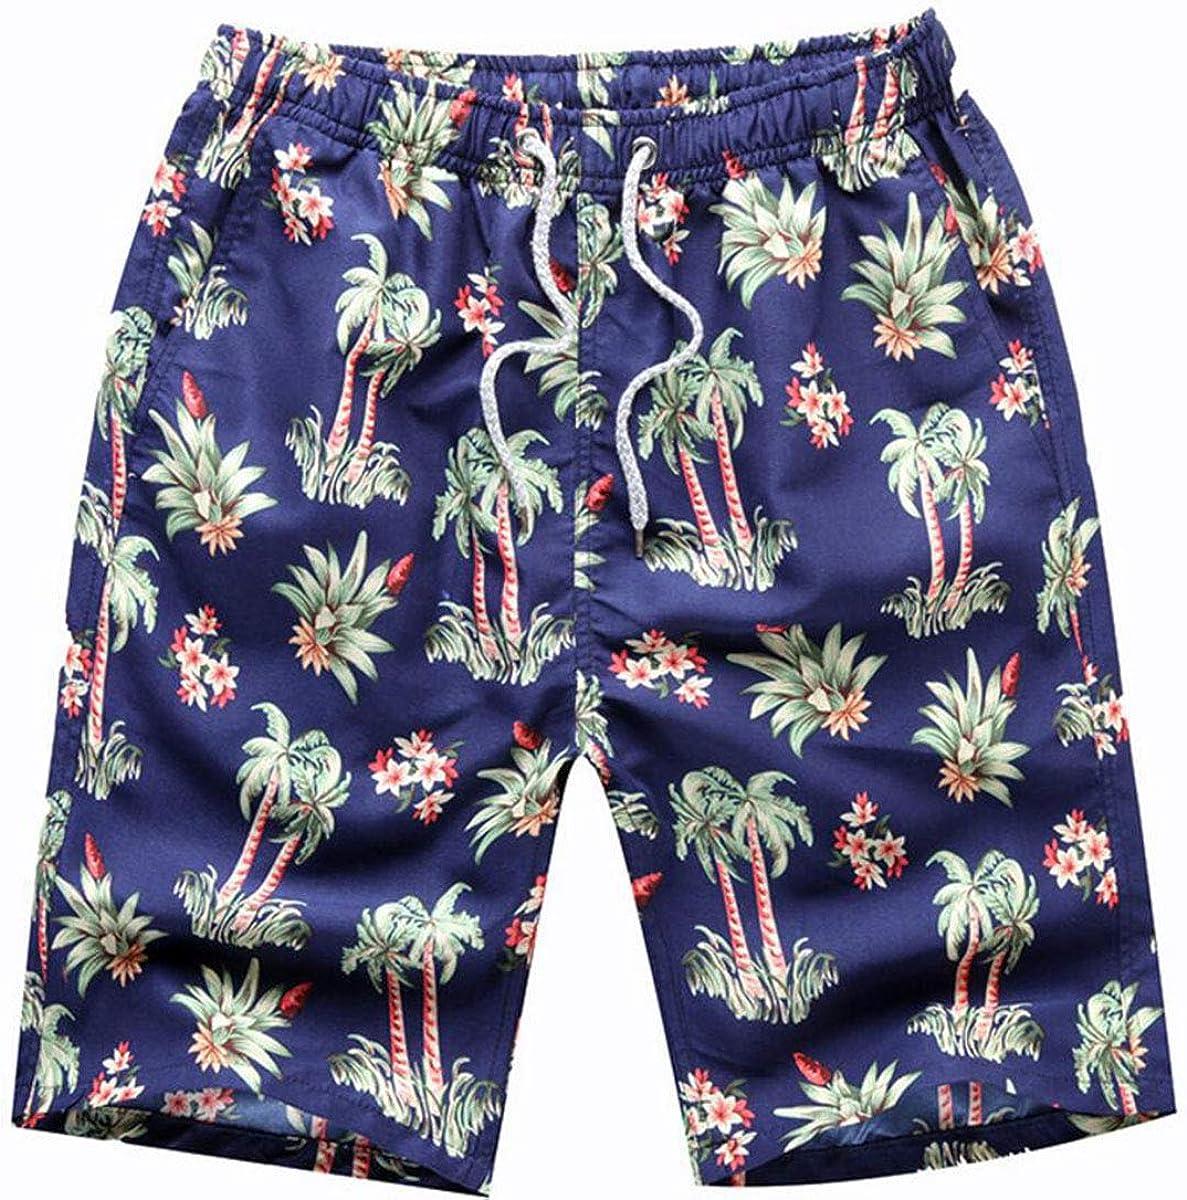 Men's Swim Trunks Beach Board Shorts with Lining -Green Coconut Style (XXXL)